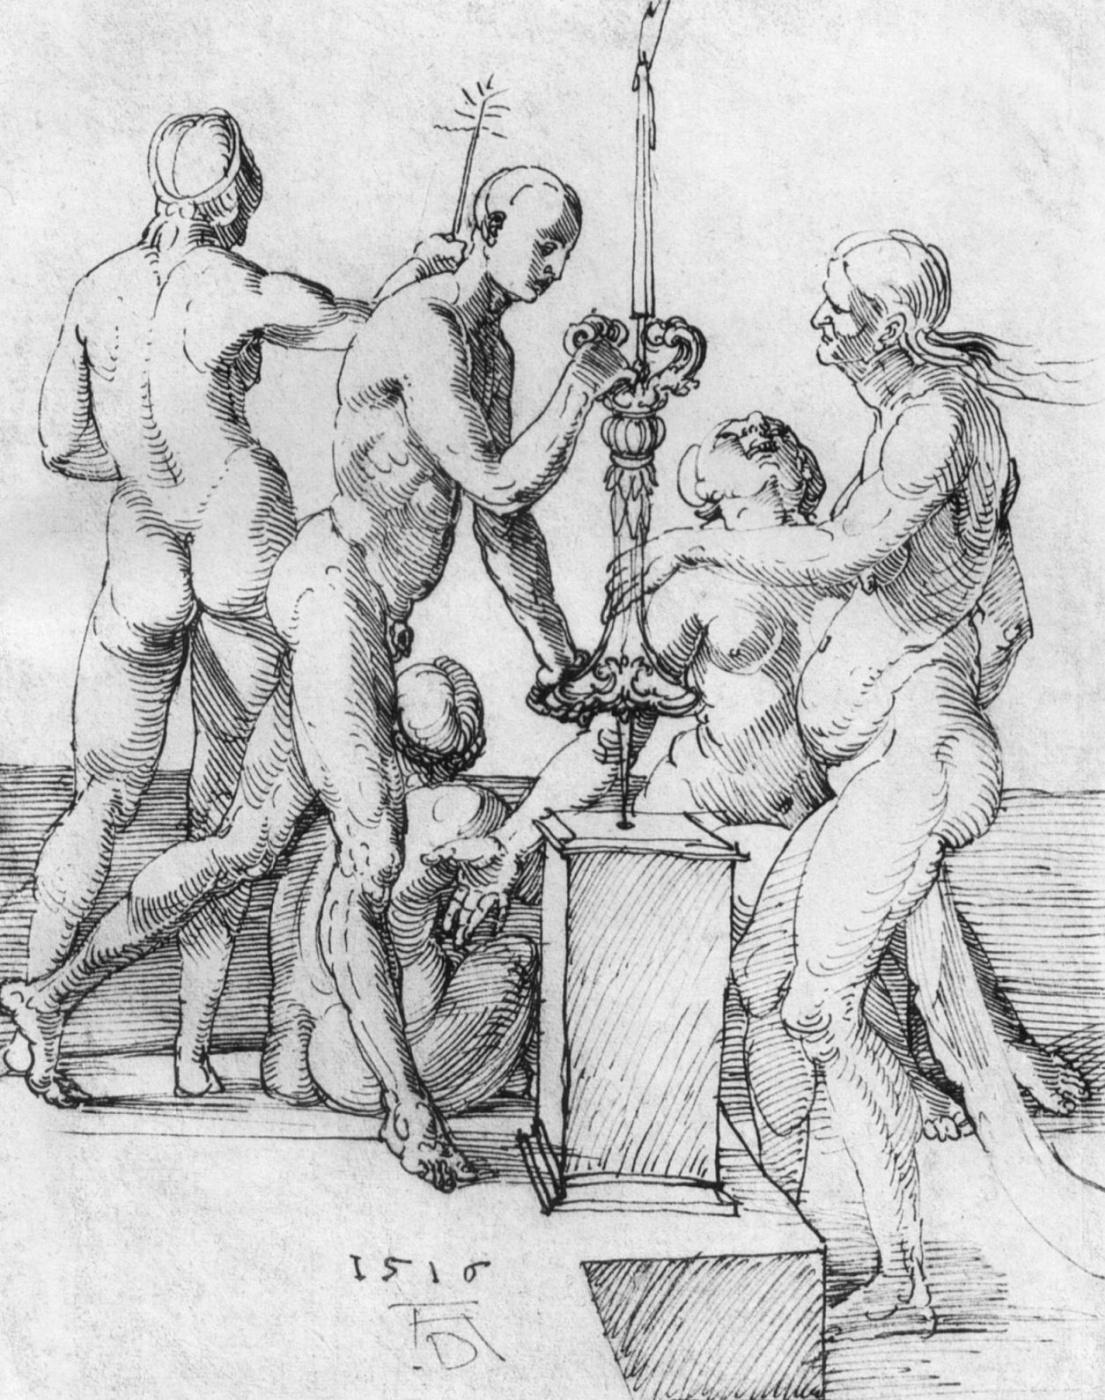 Albrecht Durer. Sketch of five naked figures